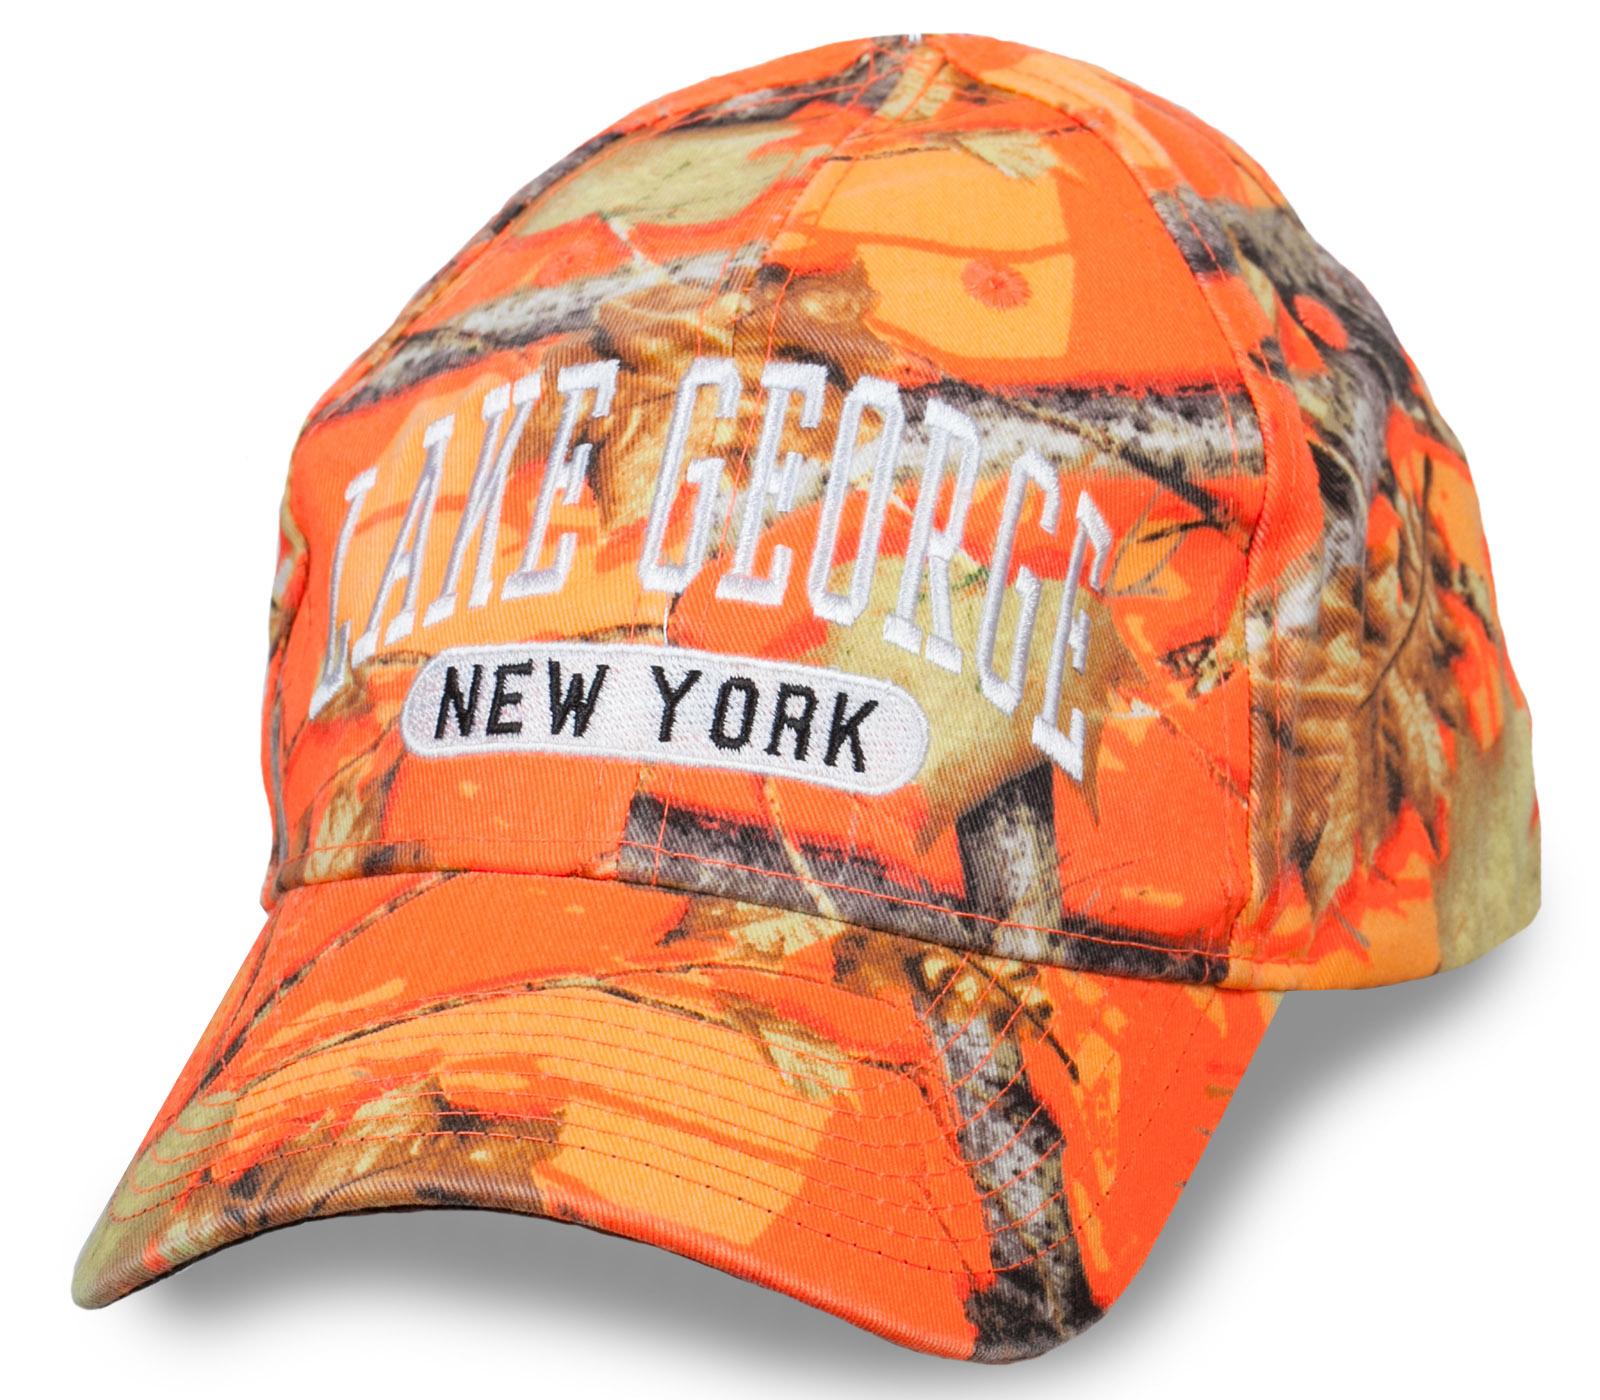 16eedae8f5d Яркая бейсболка с логотипом Lake George New York ощути себя  североамериканцем №6573